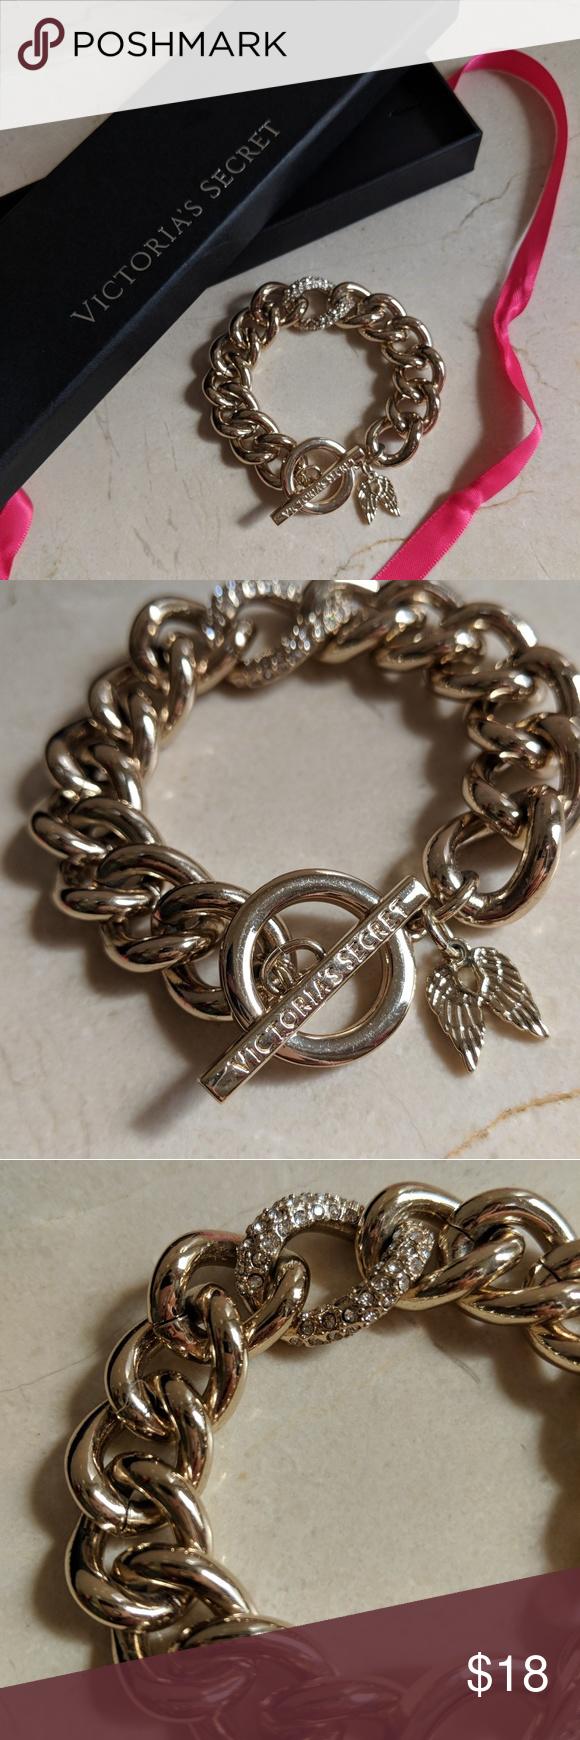 626a948c397b5 Victoria's Secret Angel Wing Chunky Charm Bracelet Stylish ...